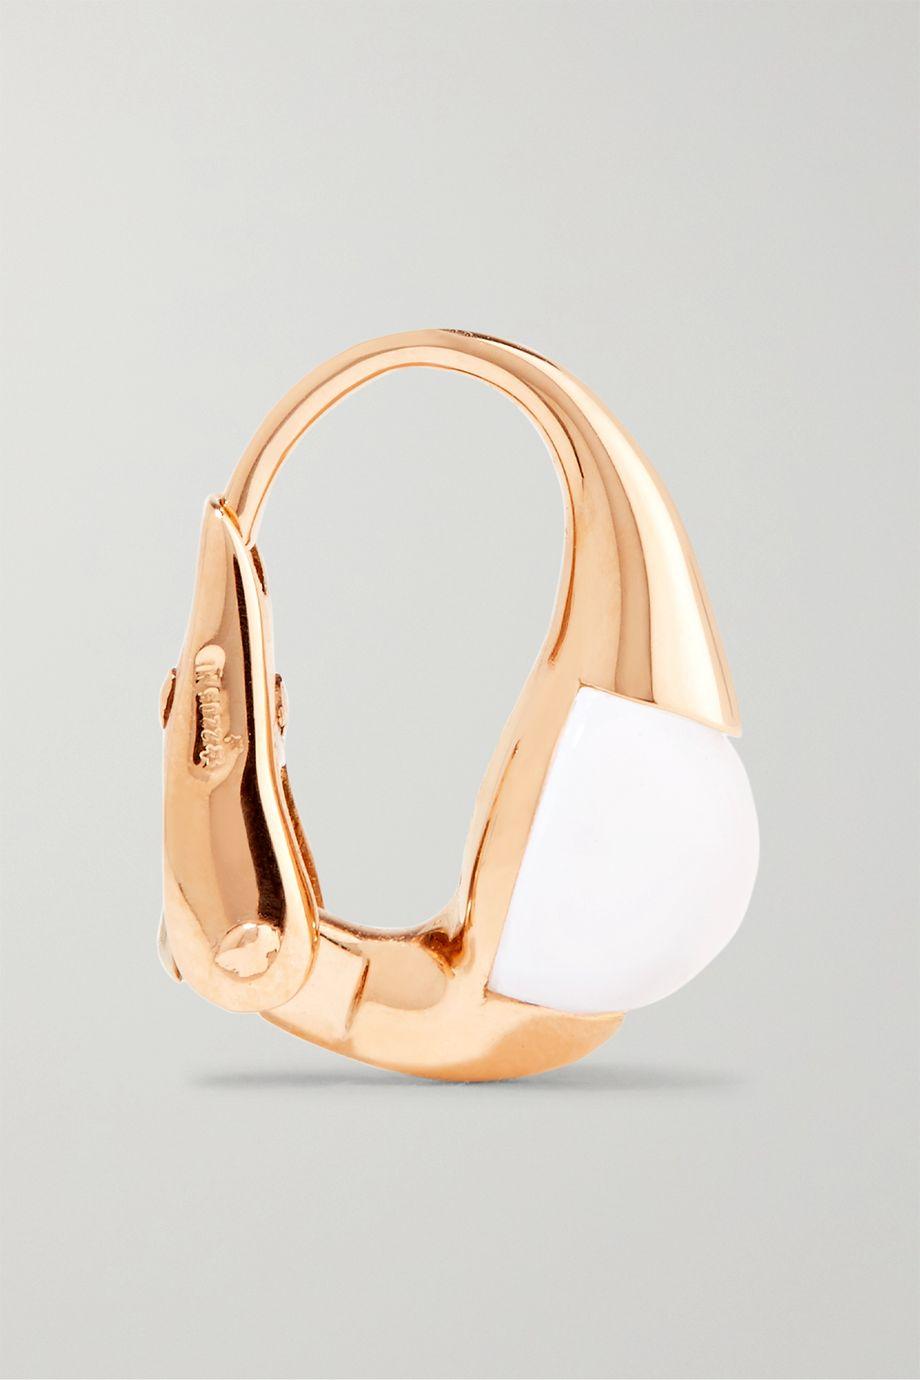 Pomellato M'ama Non M'ama 18-karat gold topaz earrings